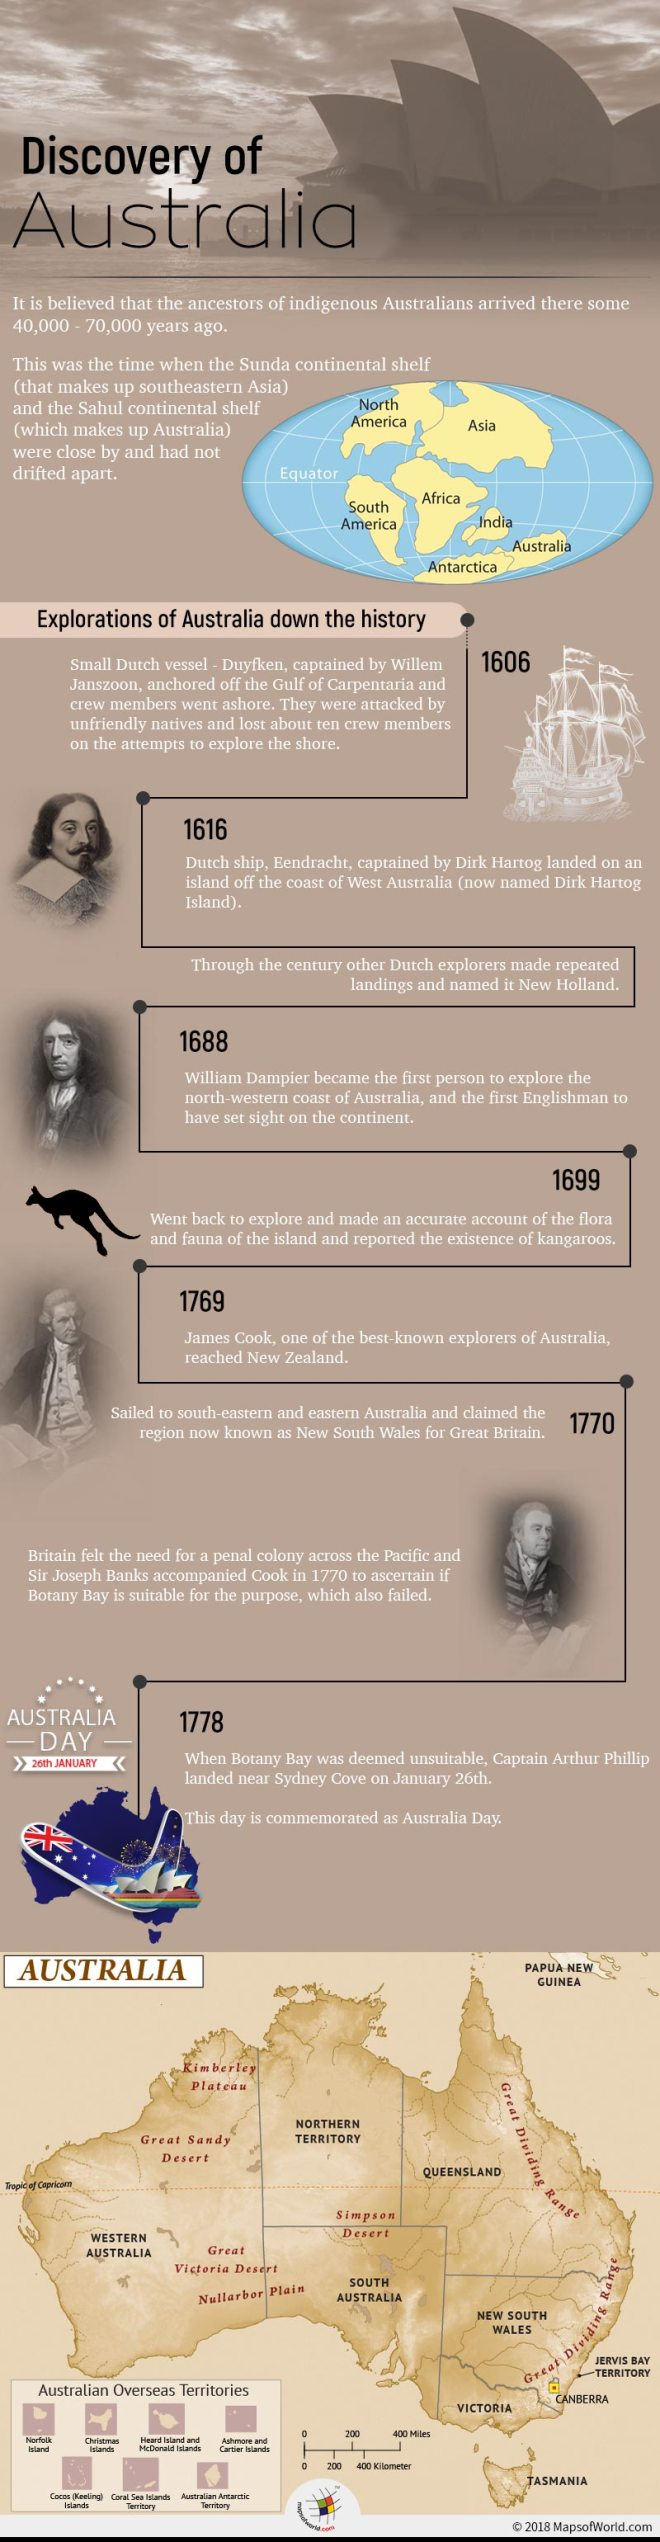 Who Discovered Australia?